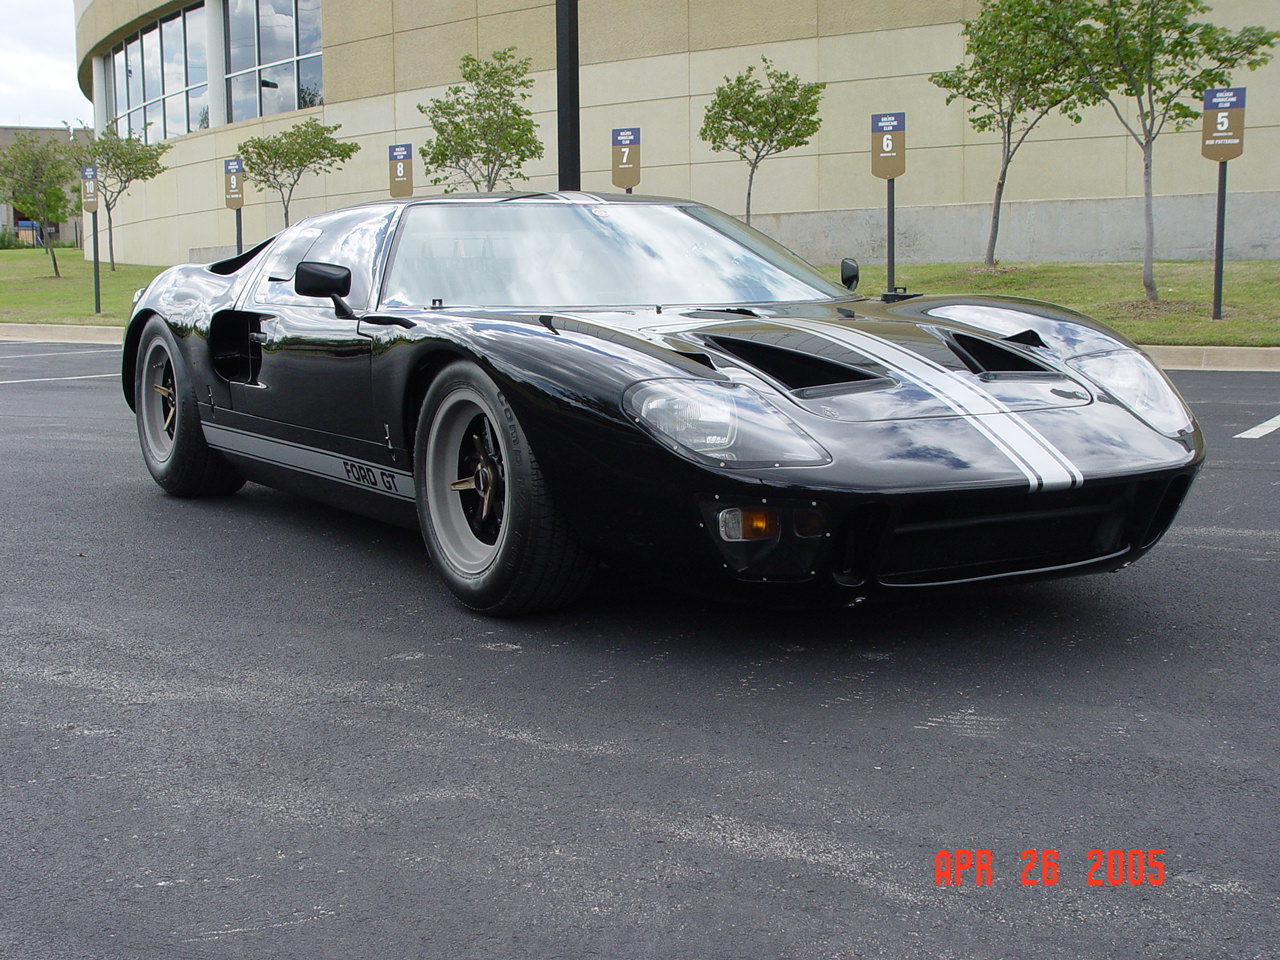 67 Corvette For Sale >> 1967 GT40 - Sinor Prestige Automobiles, Inc. 1967 Ford GT40 67GT40P1096